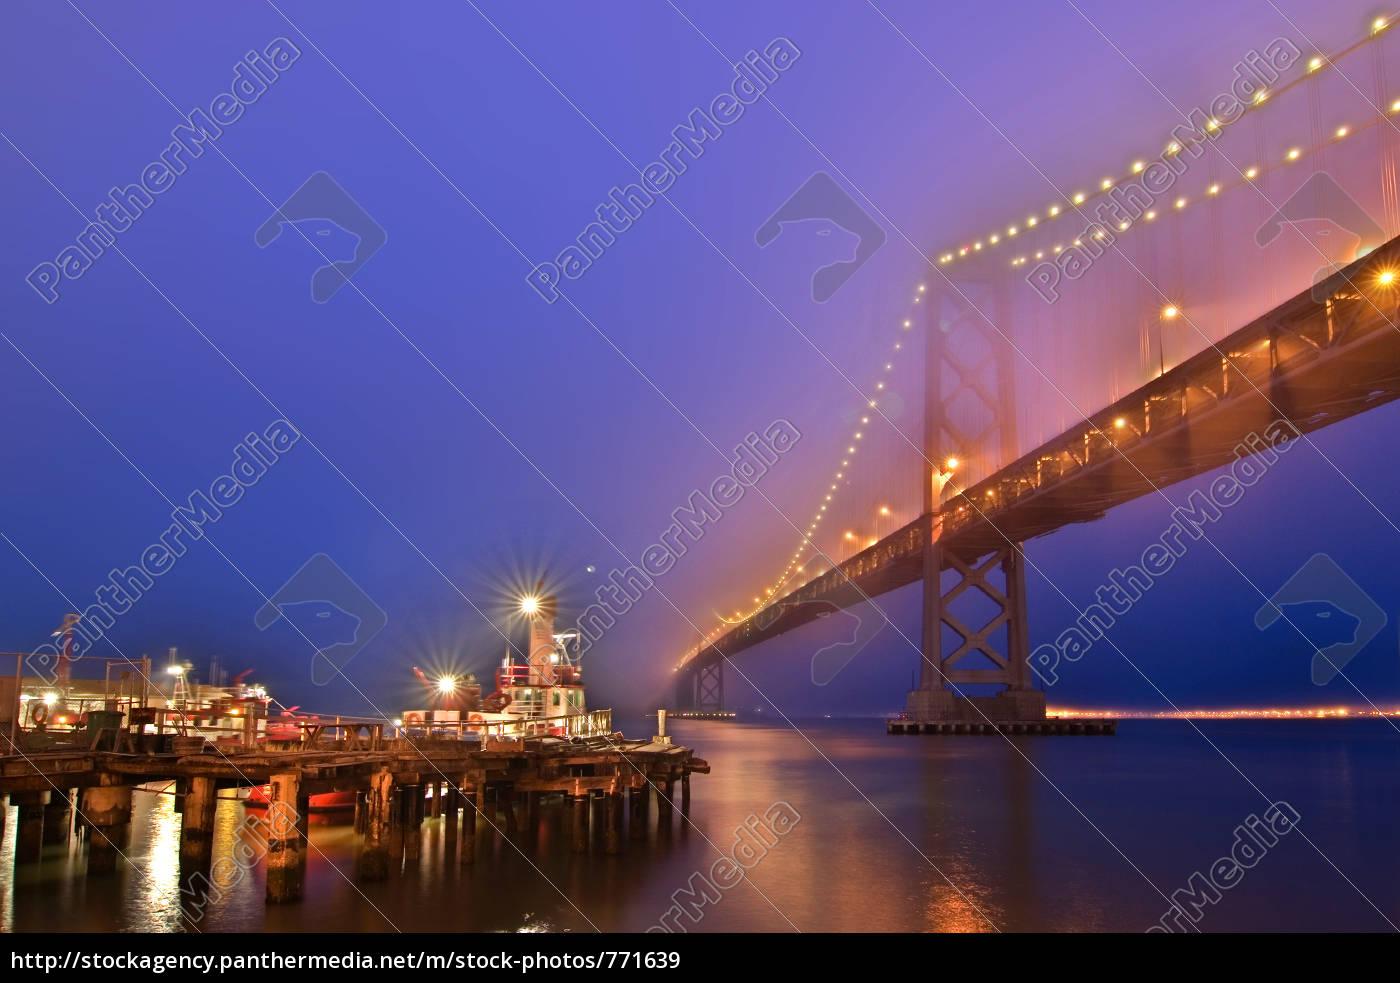 san, francisco, oakland, bridge, in, the - 771639